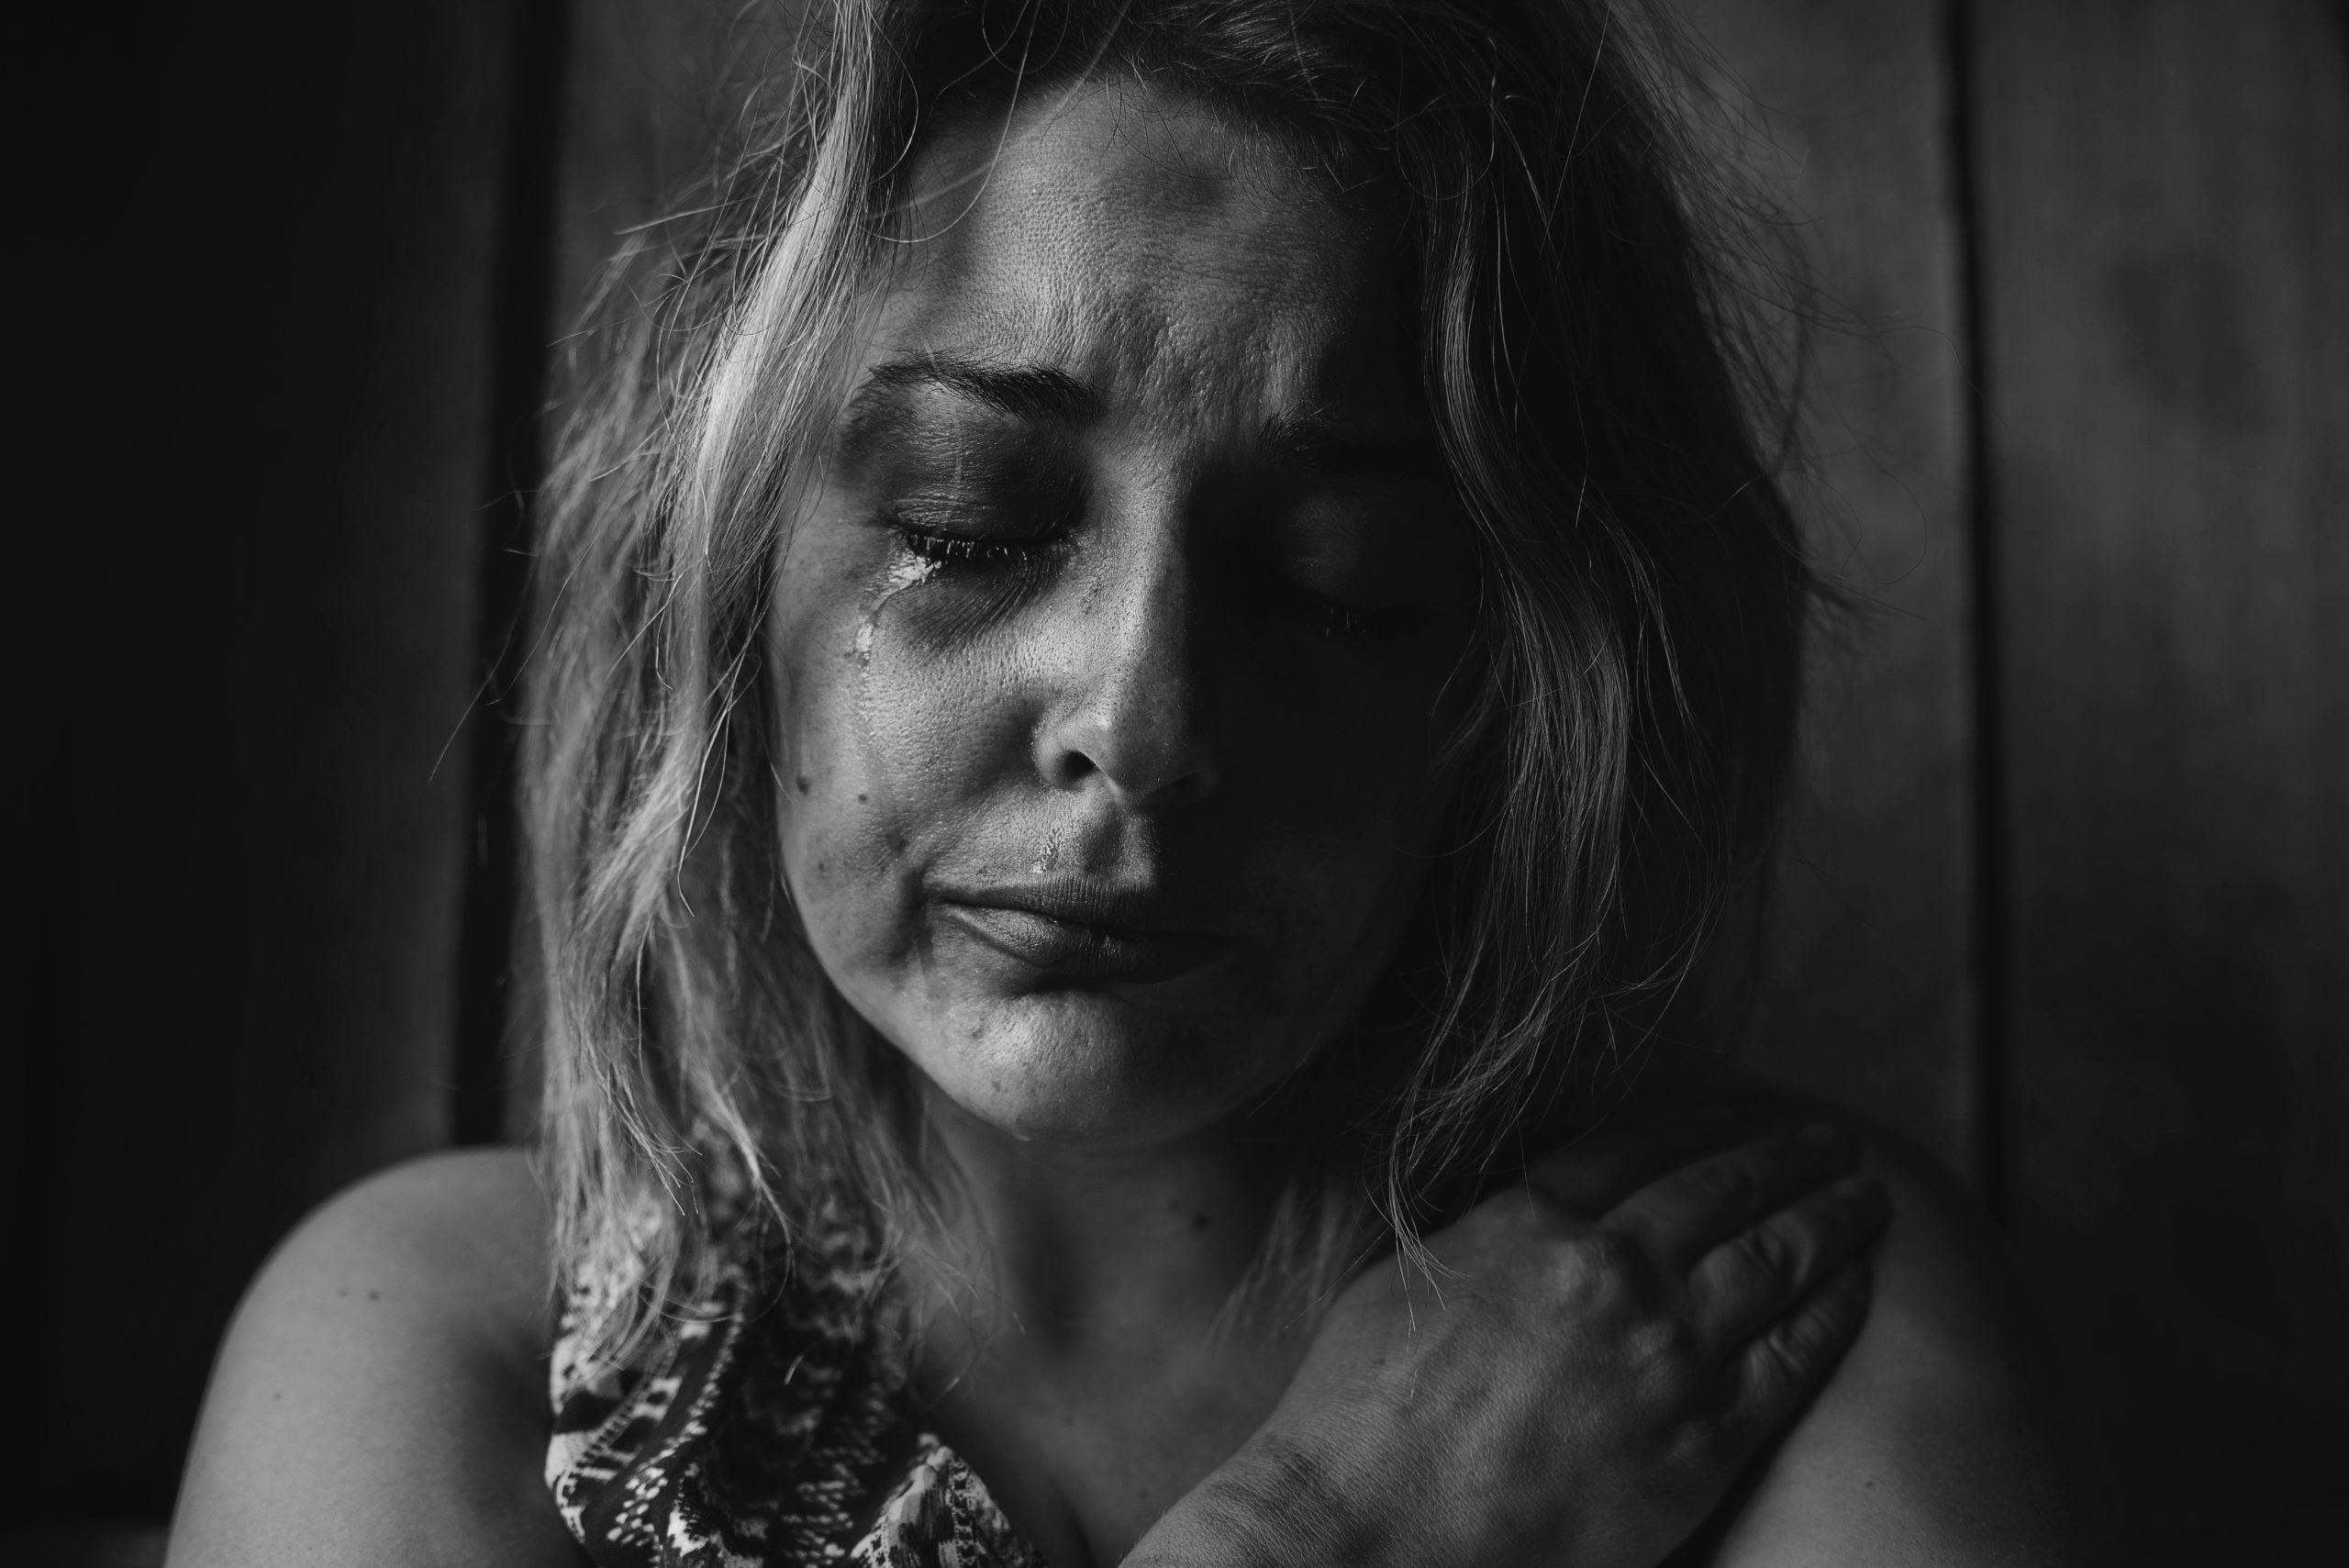 Violence against women and children - CMR Gauteng Oos